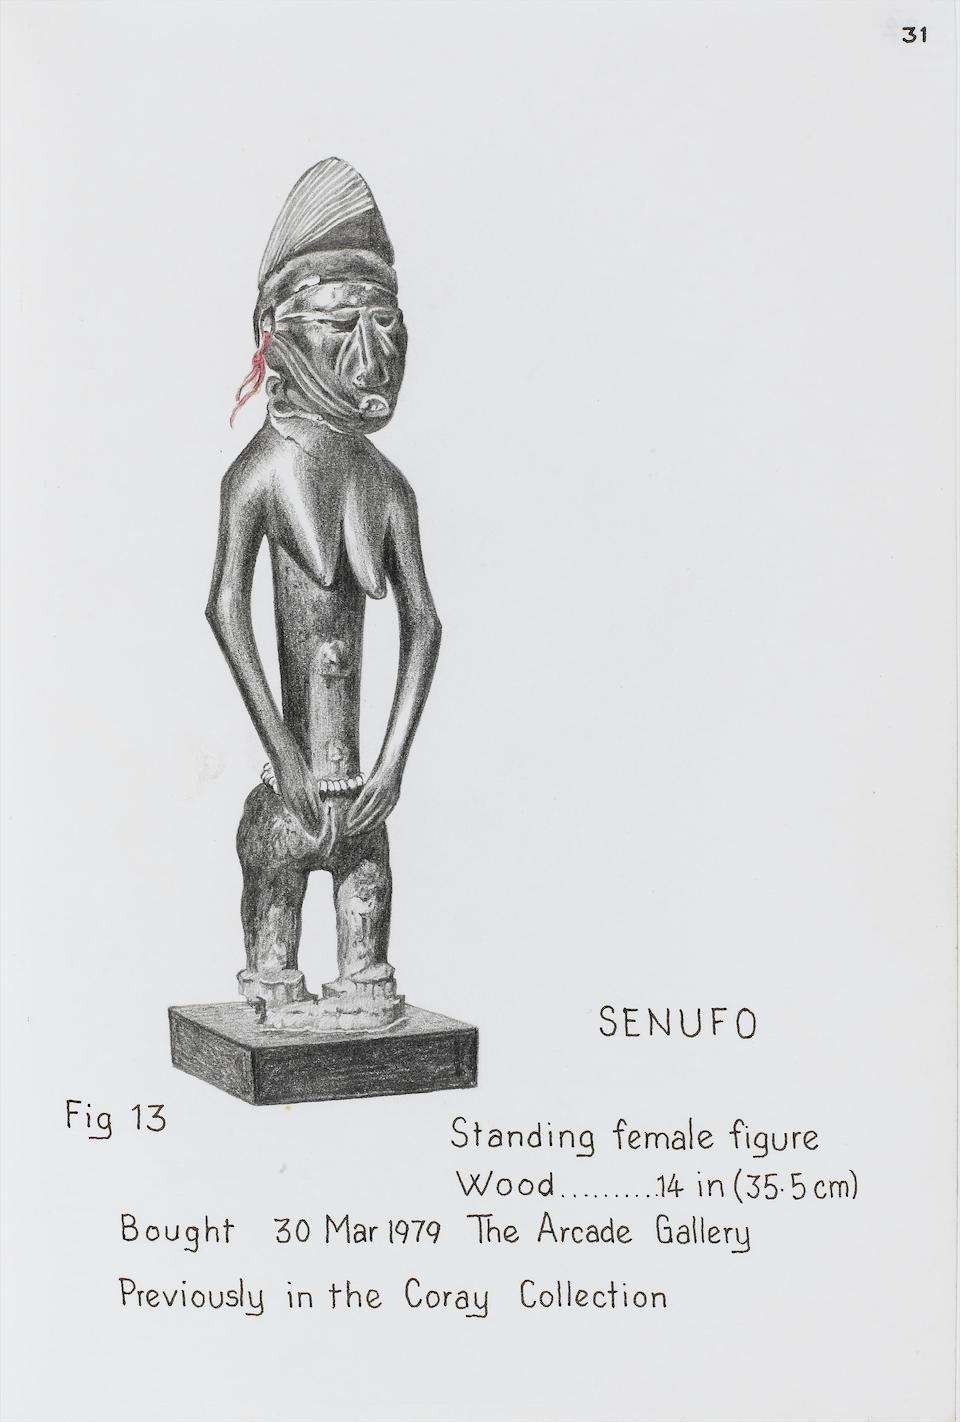 A Senufo female figure 35.5cm